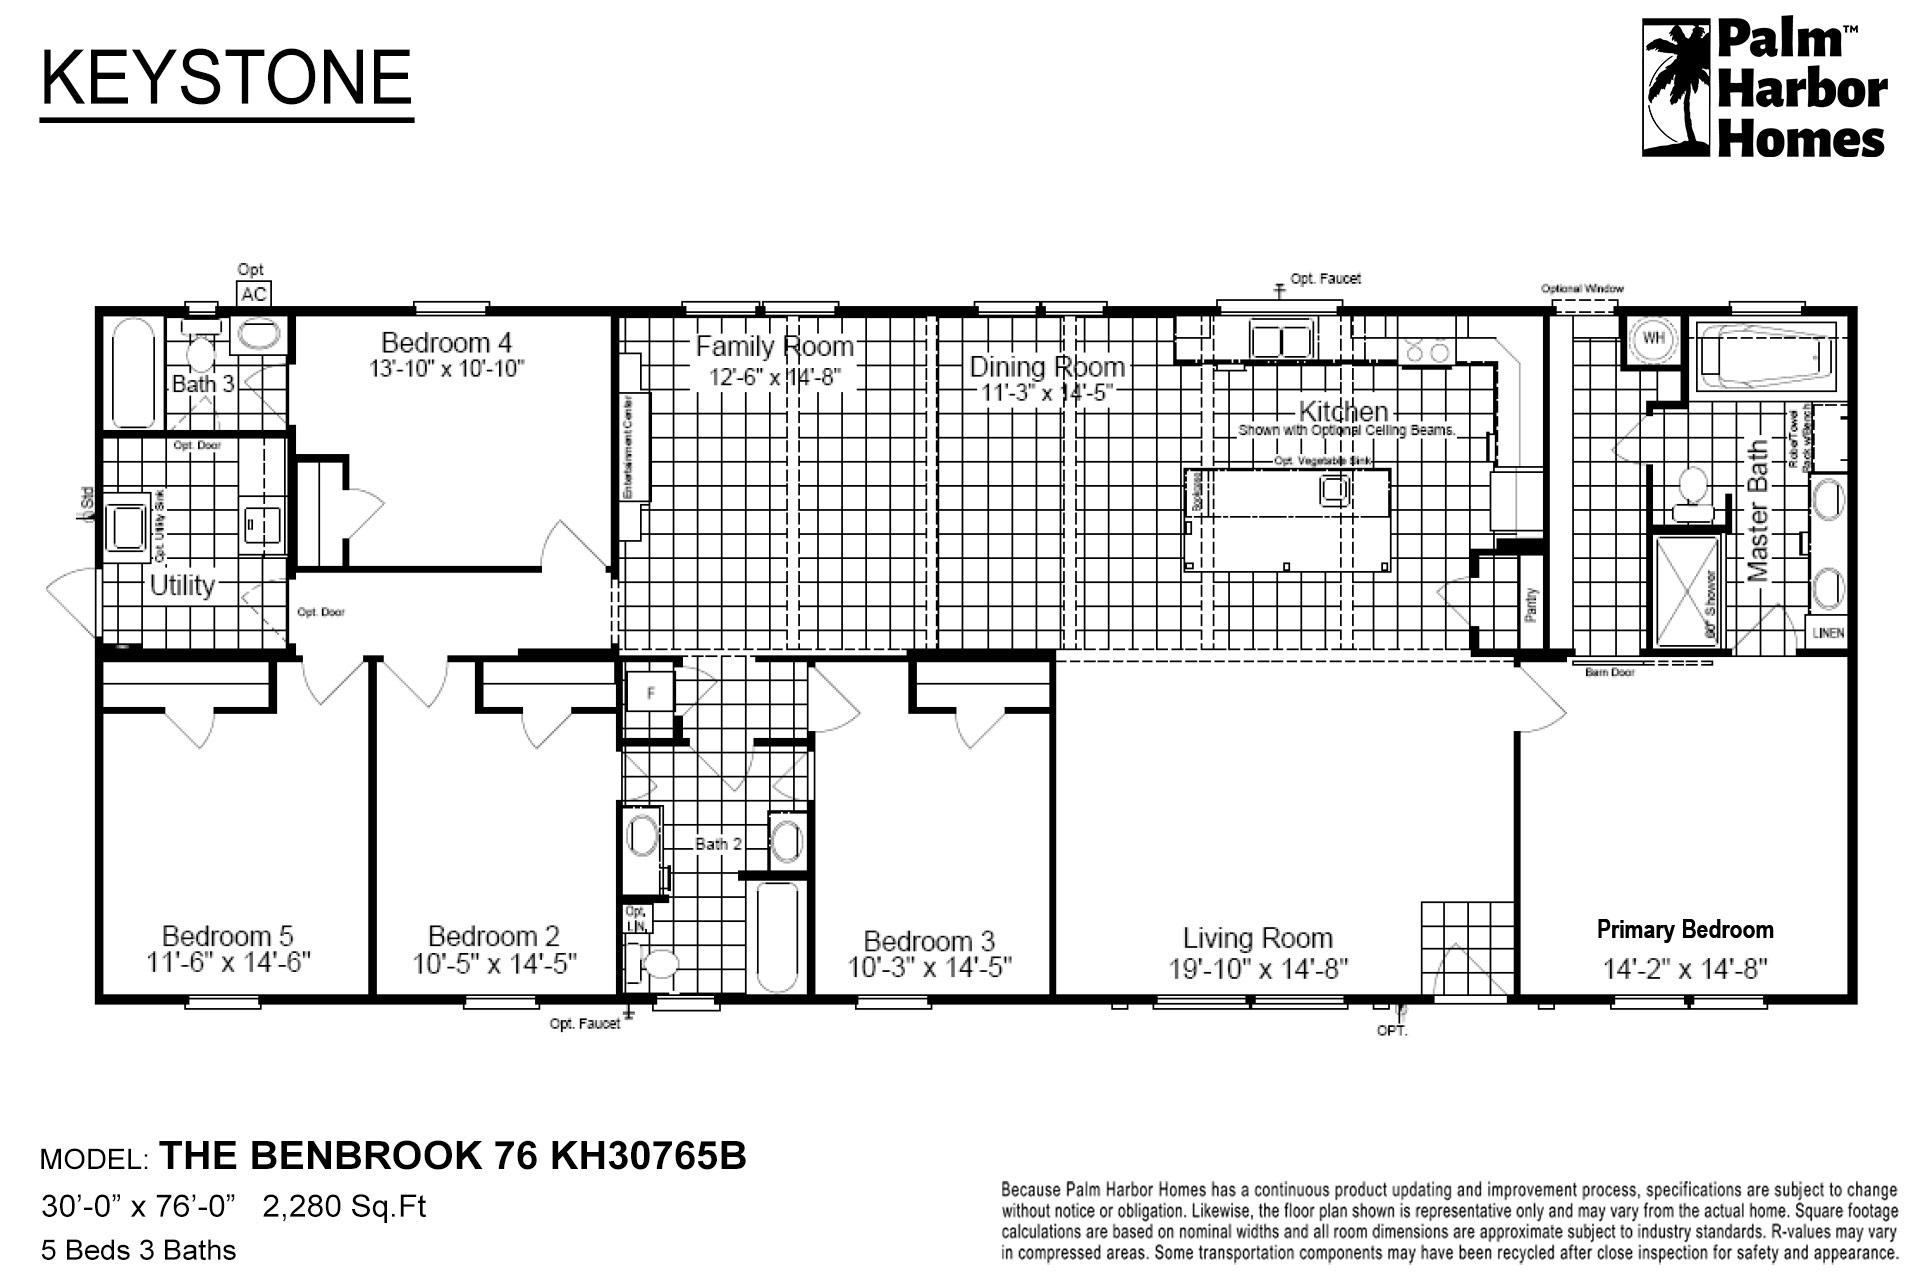 Keystone The Benbrook 76 KH30765B Layout